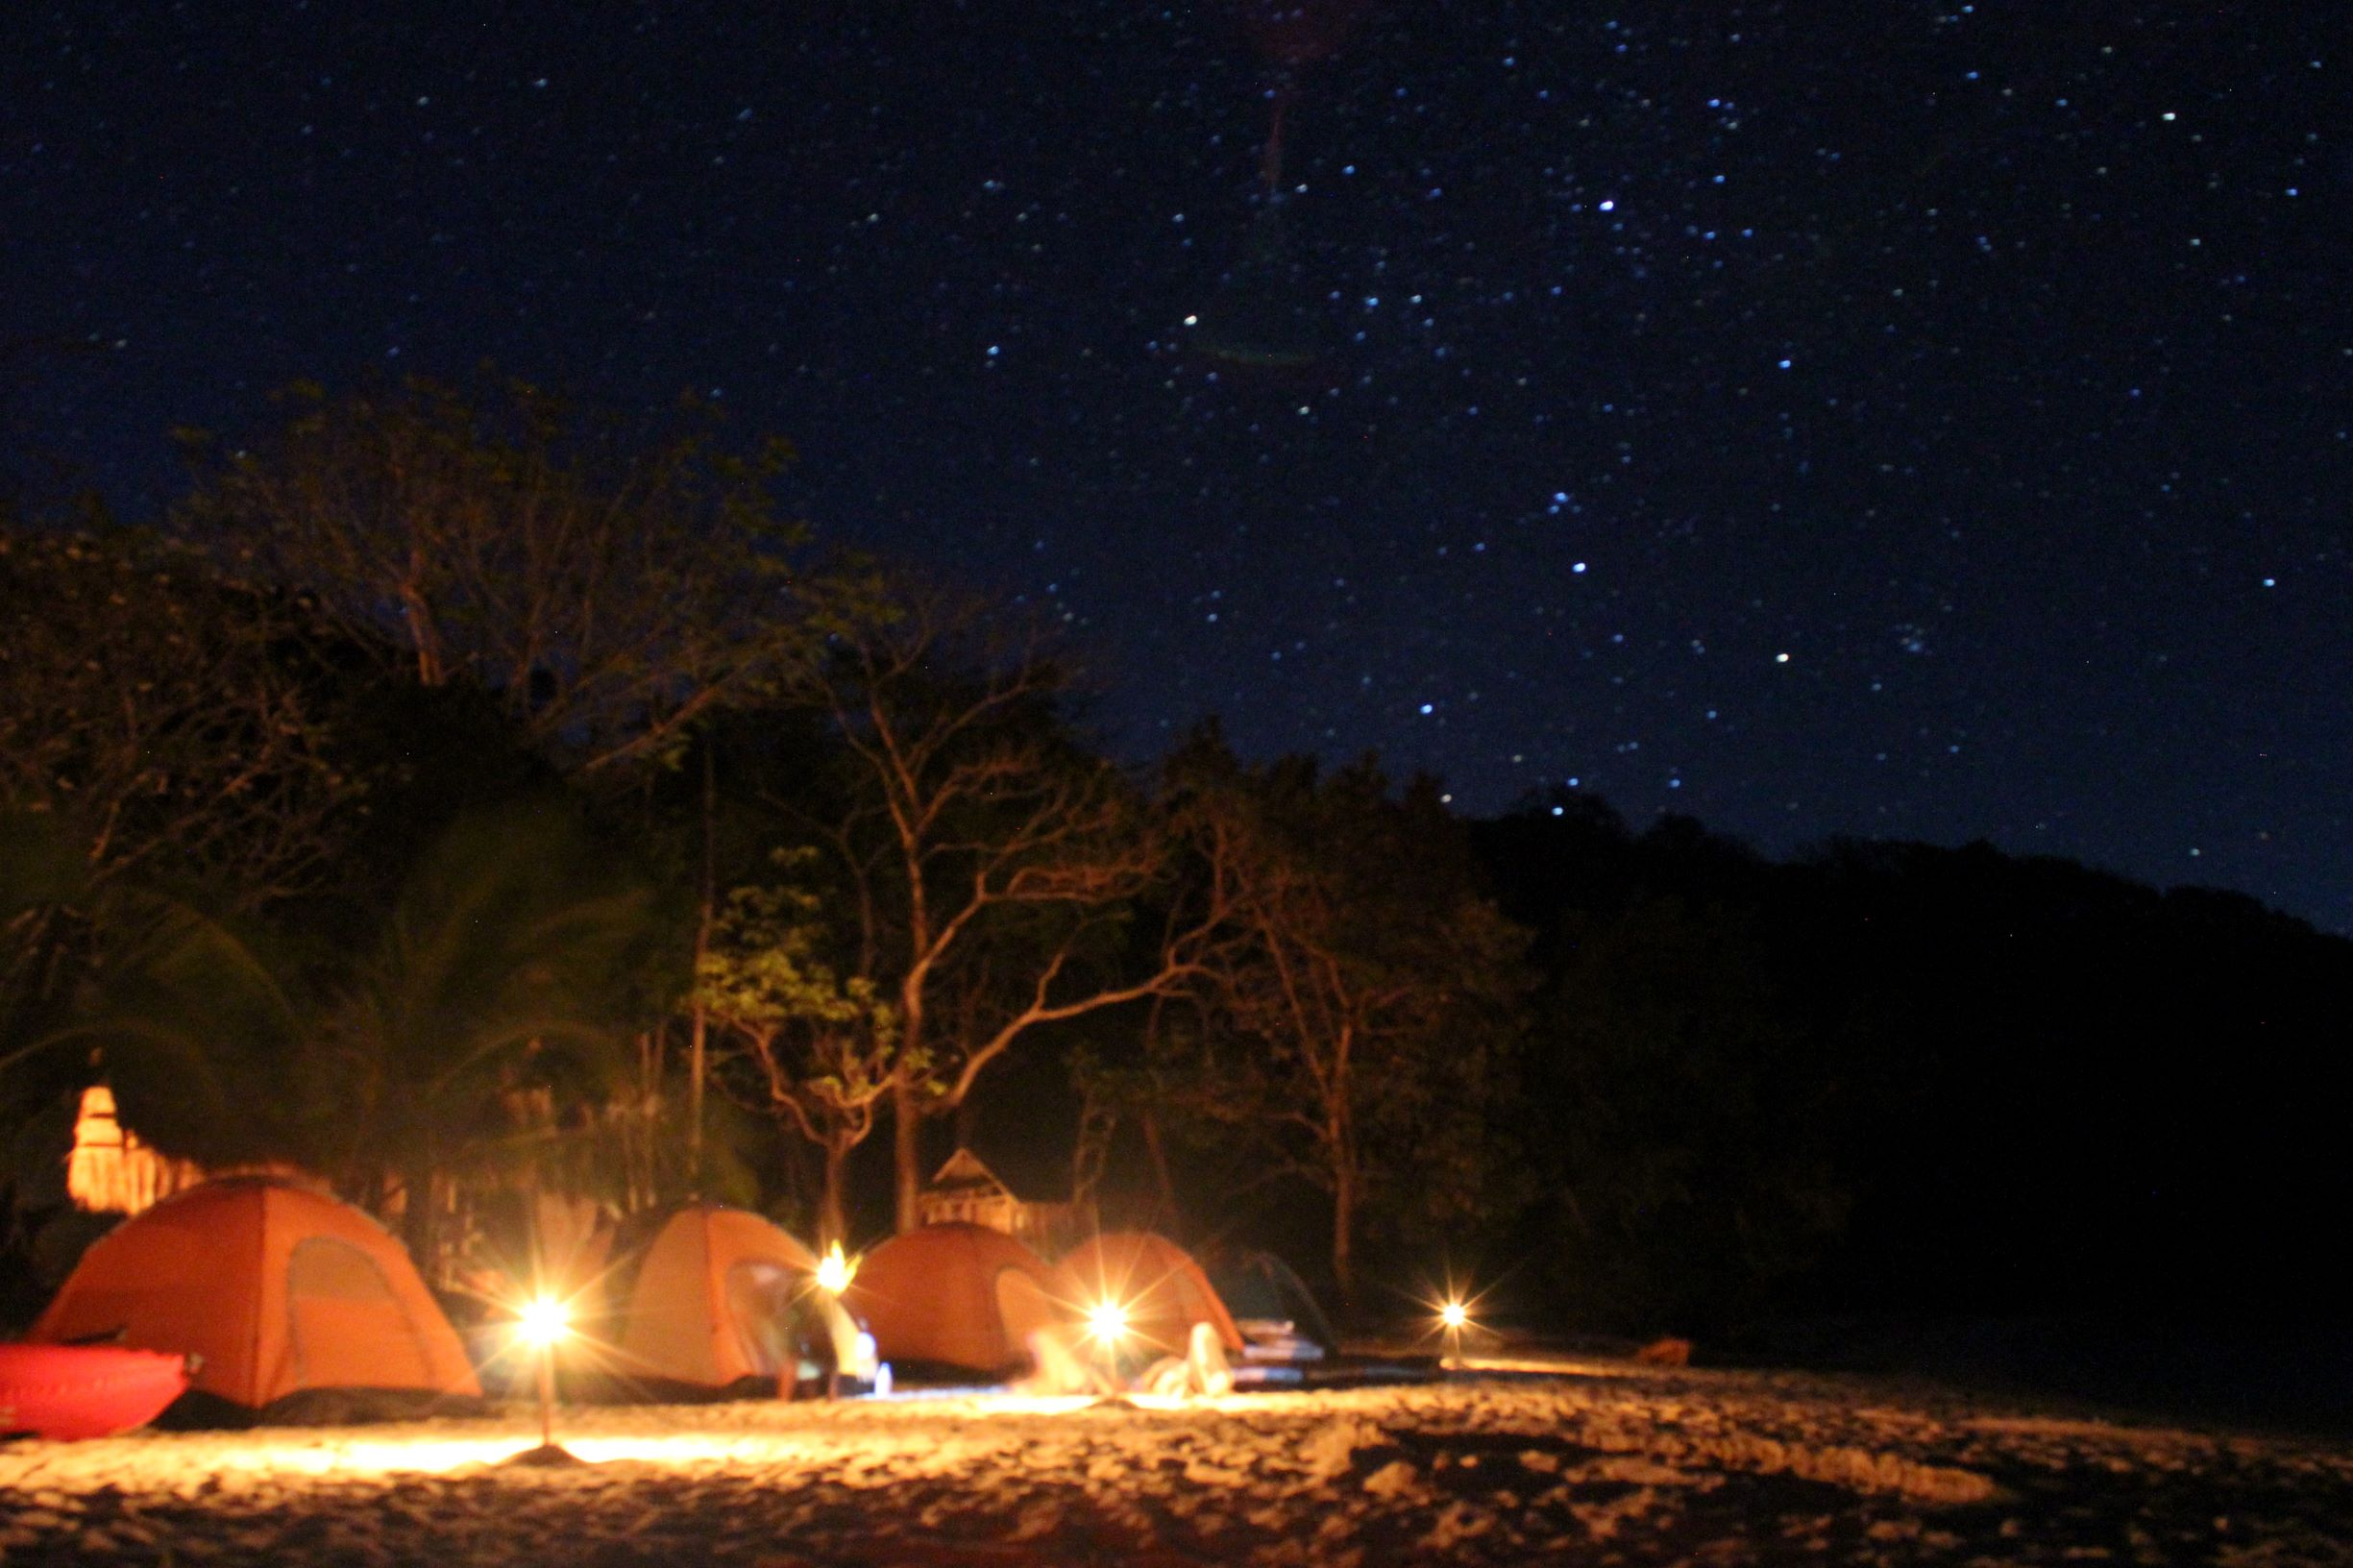 Our campsite night 1. Photo credit Janine Johnson